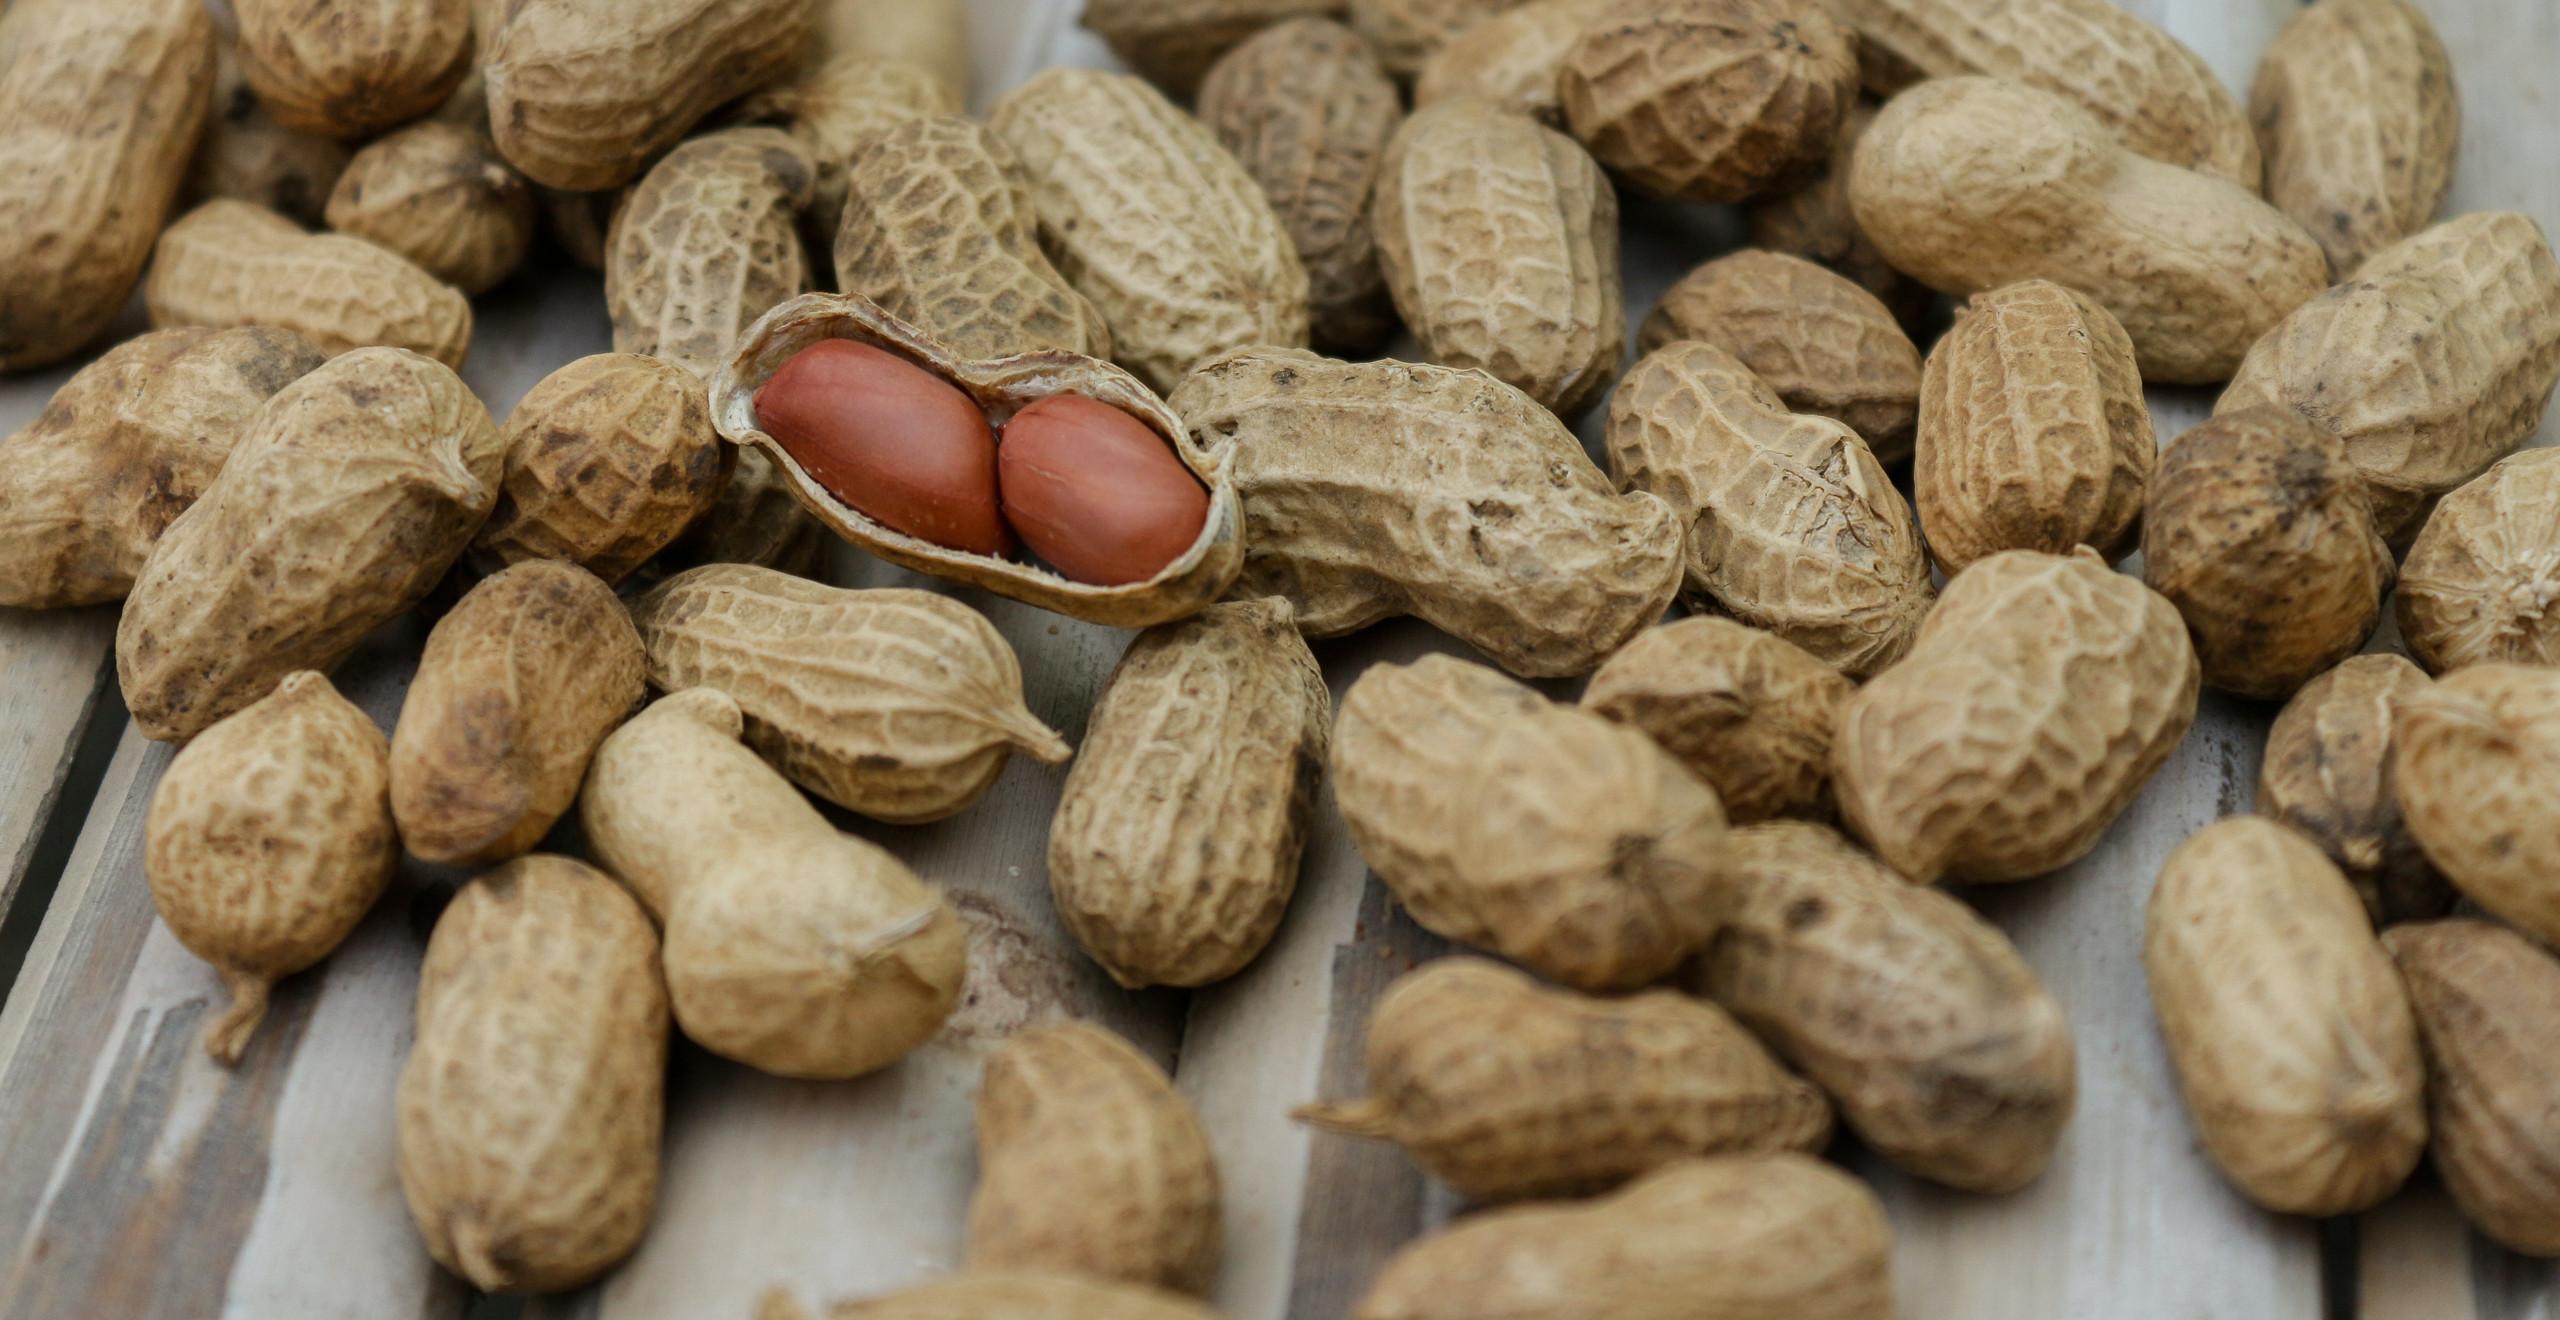 Ground Nuts are rich source of Vitamin E